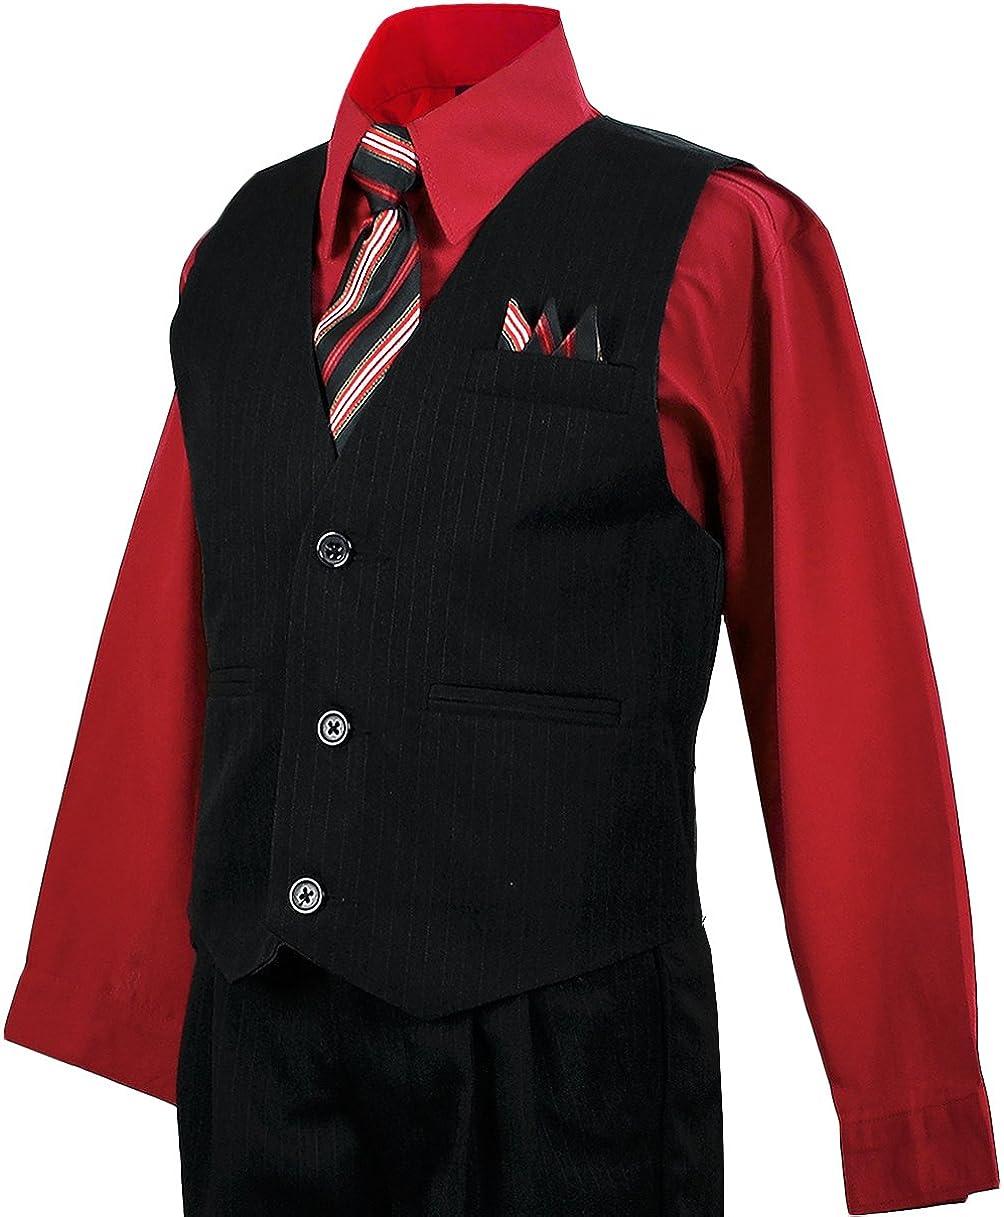 Boy/'s Black 4 Piece Formal Pin Stripe Suit Vest  Red Dress Shirt  Tie All Sizes